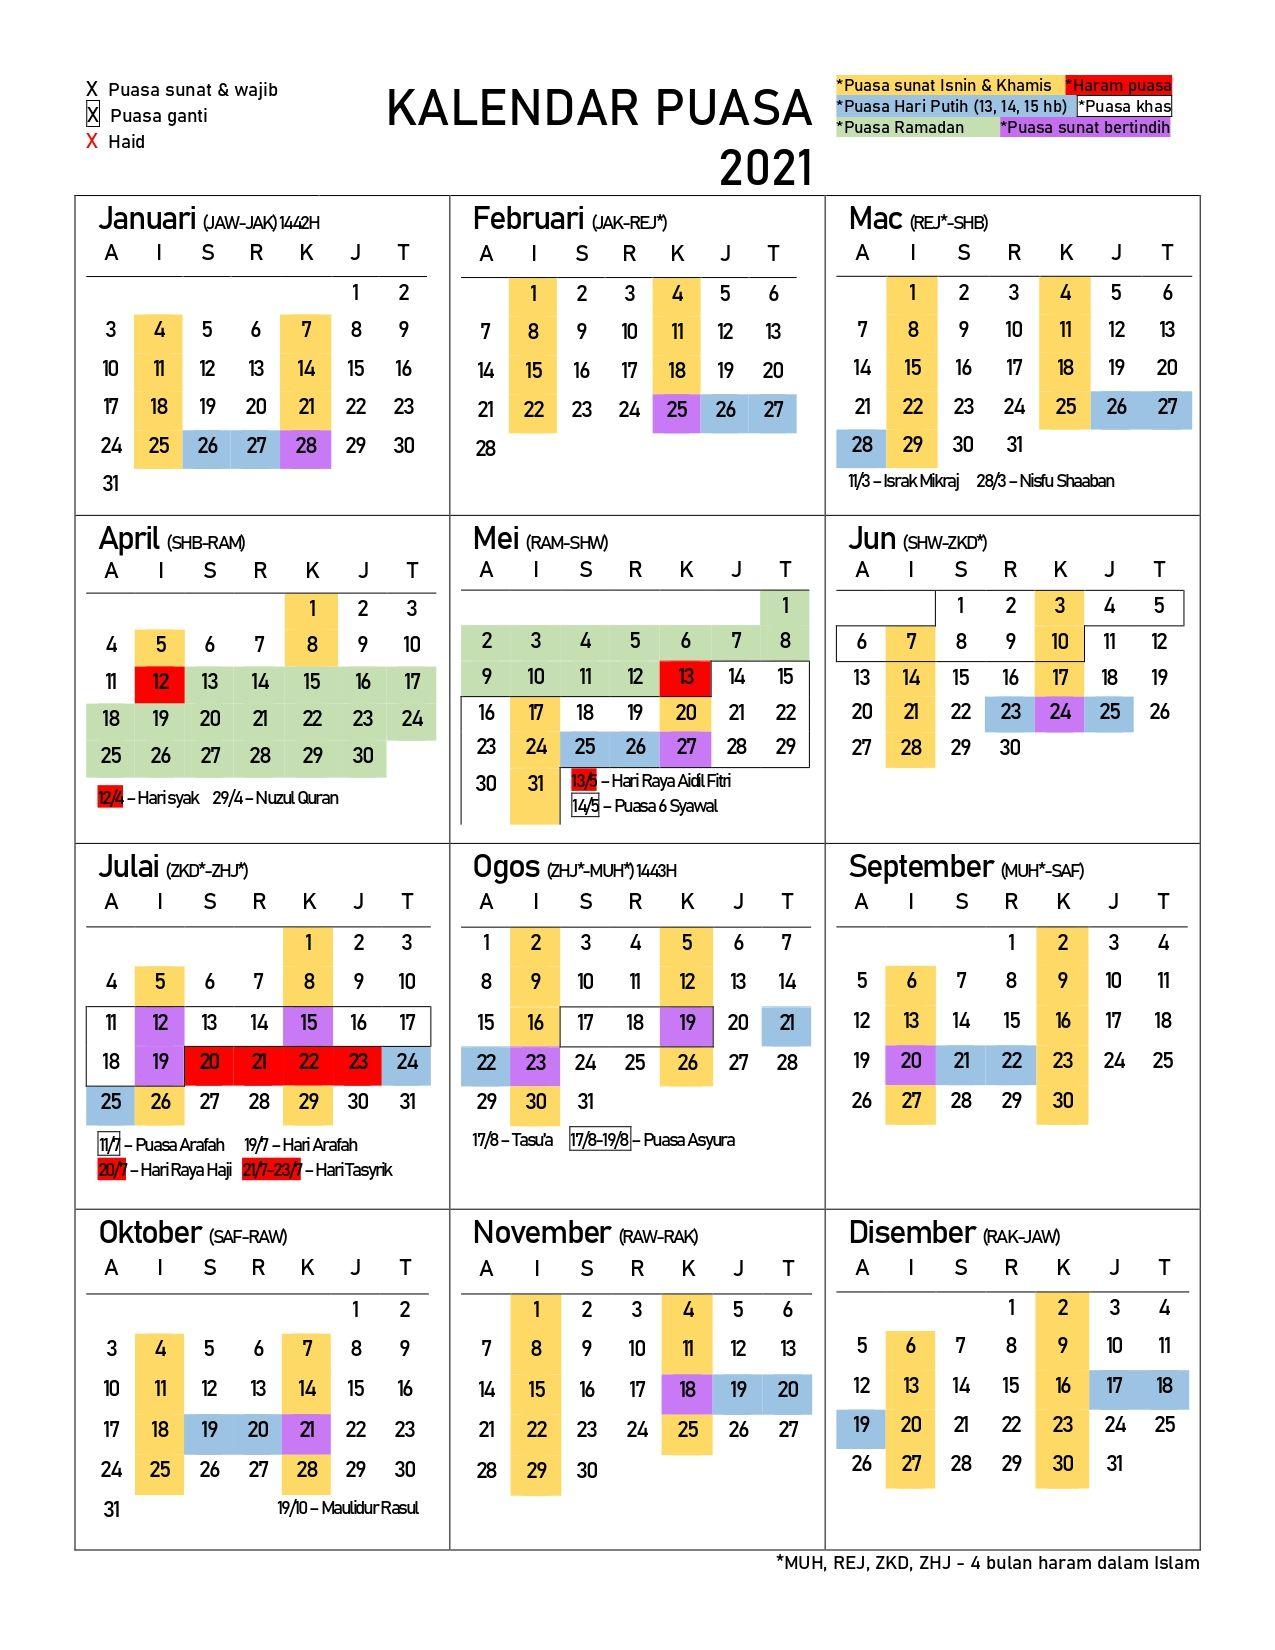 Kalendar Puasa 2021 Islamic Phrases Learn Islam Islam Facts